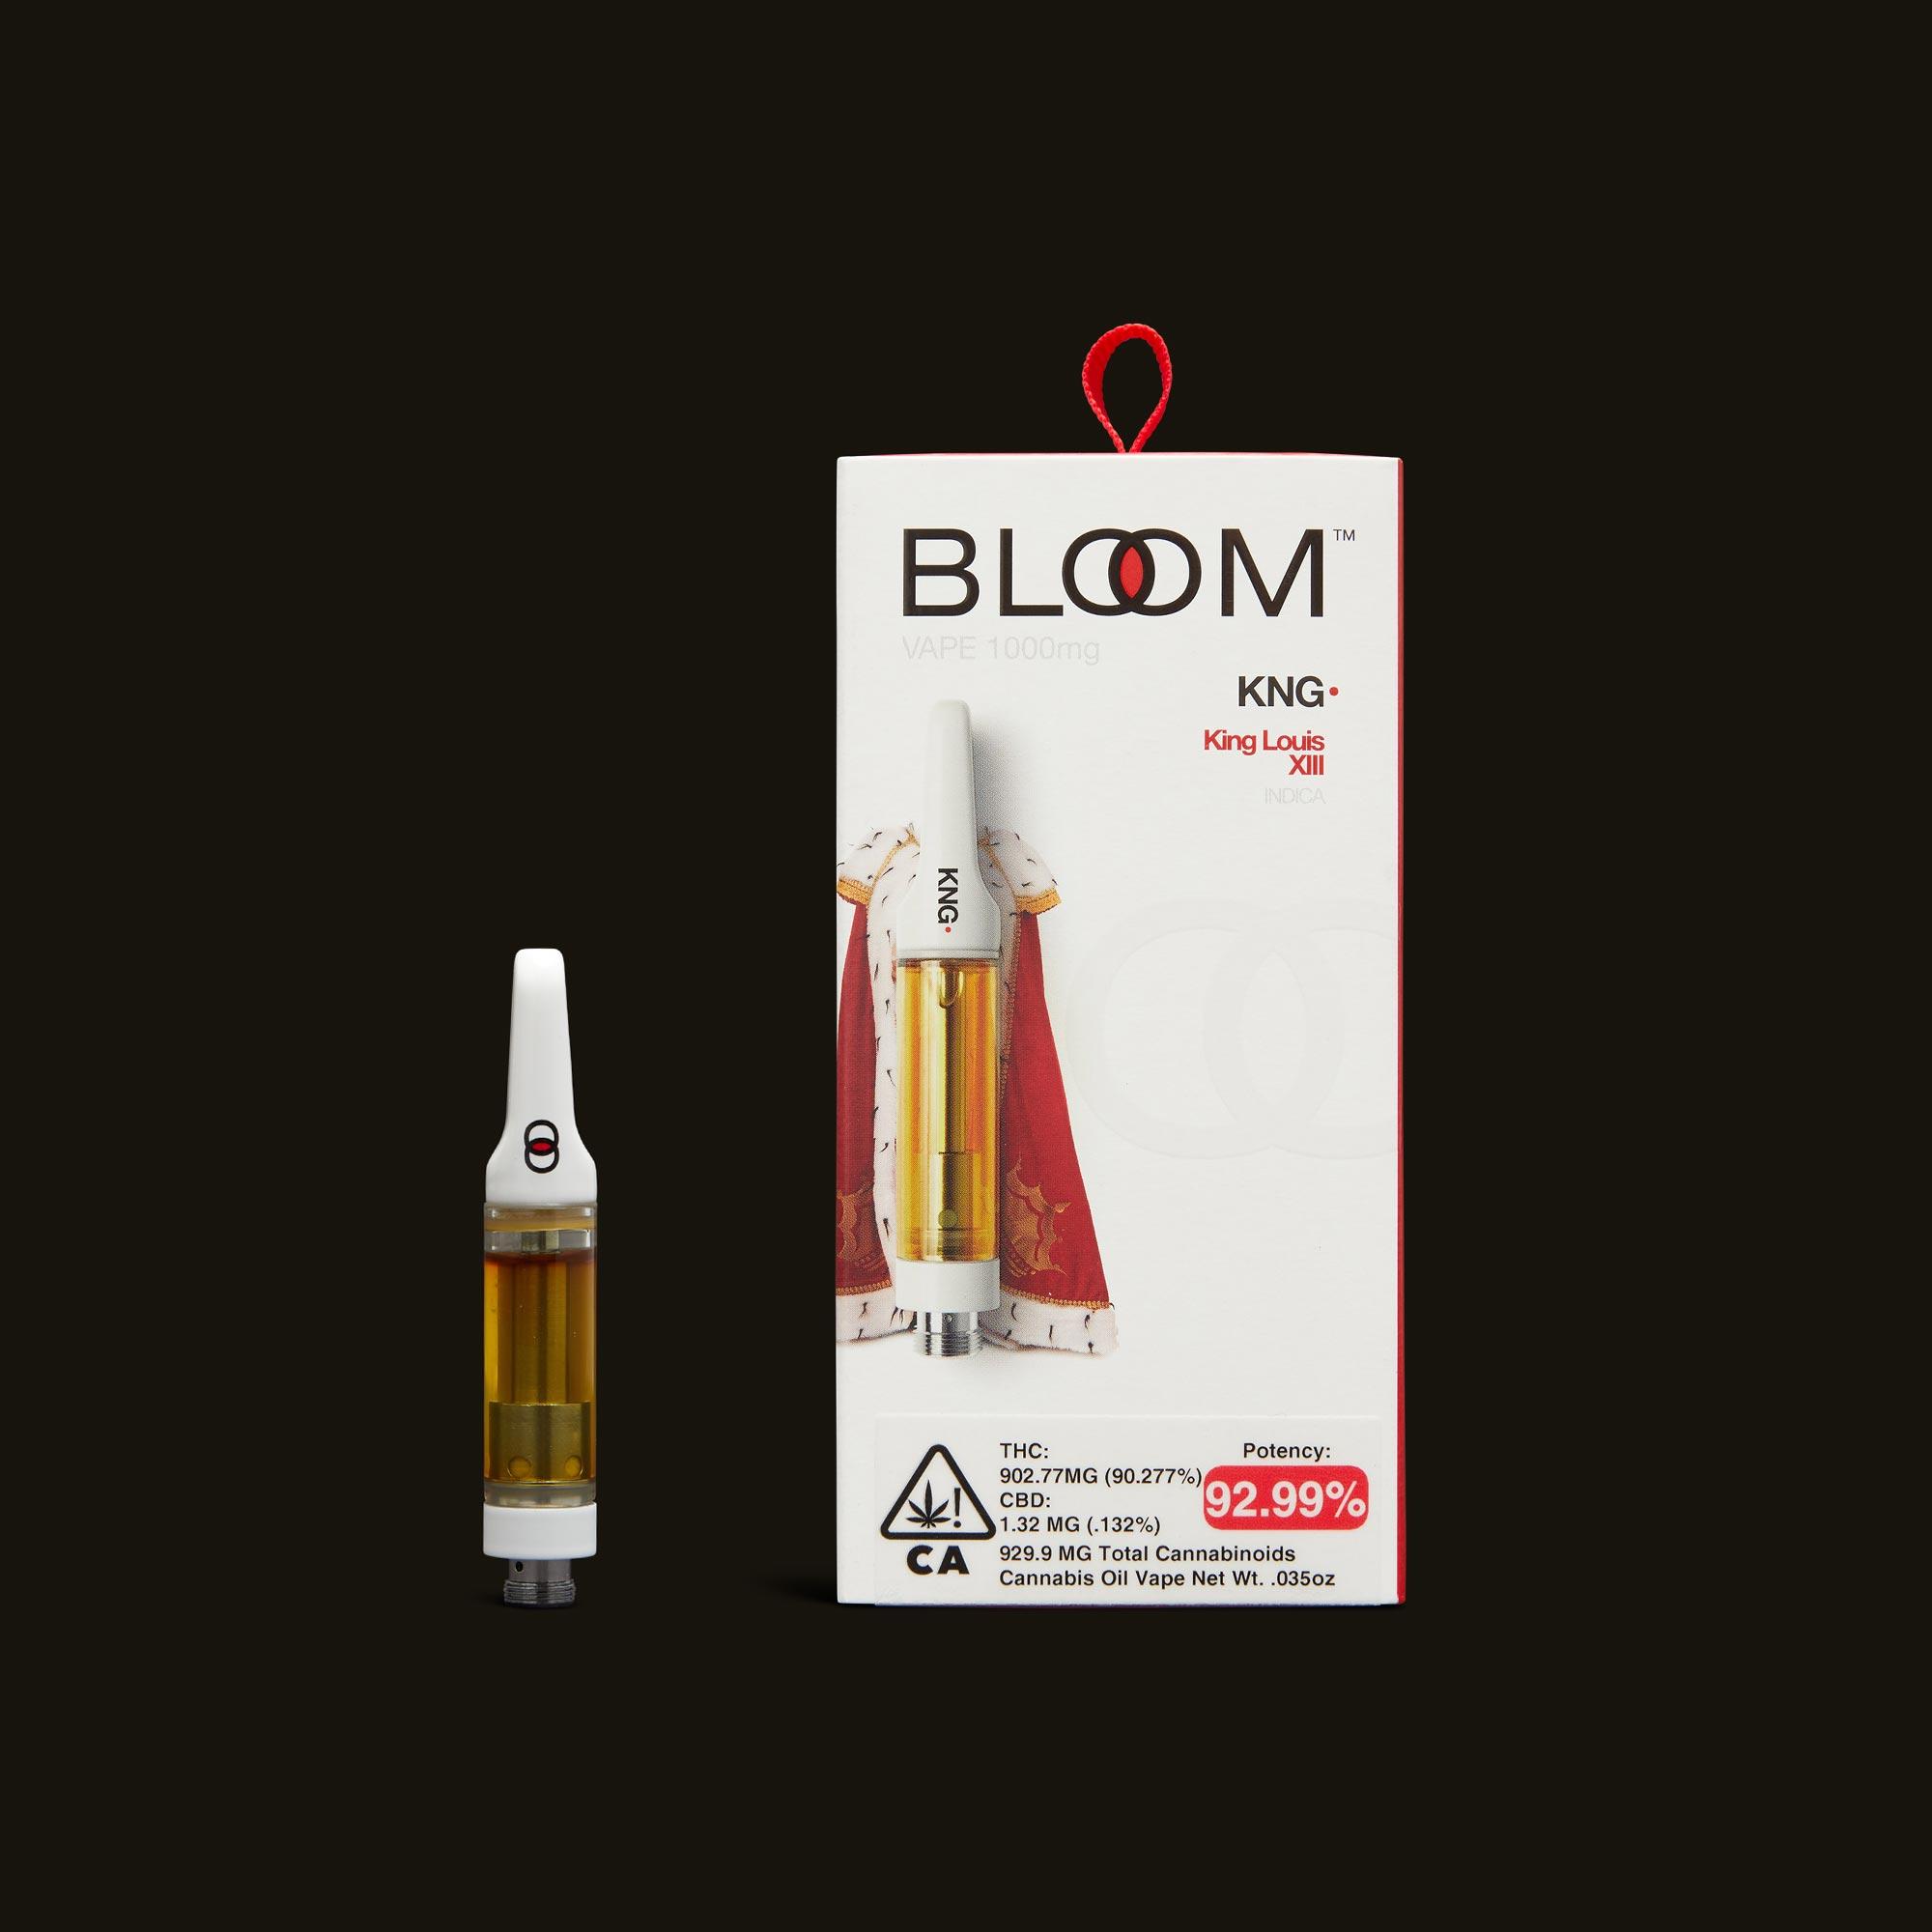 Bloom Brands King Louis XIII Cartridge - 1g